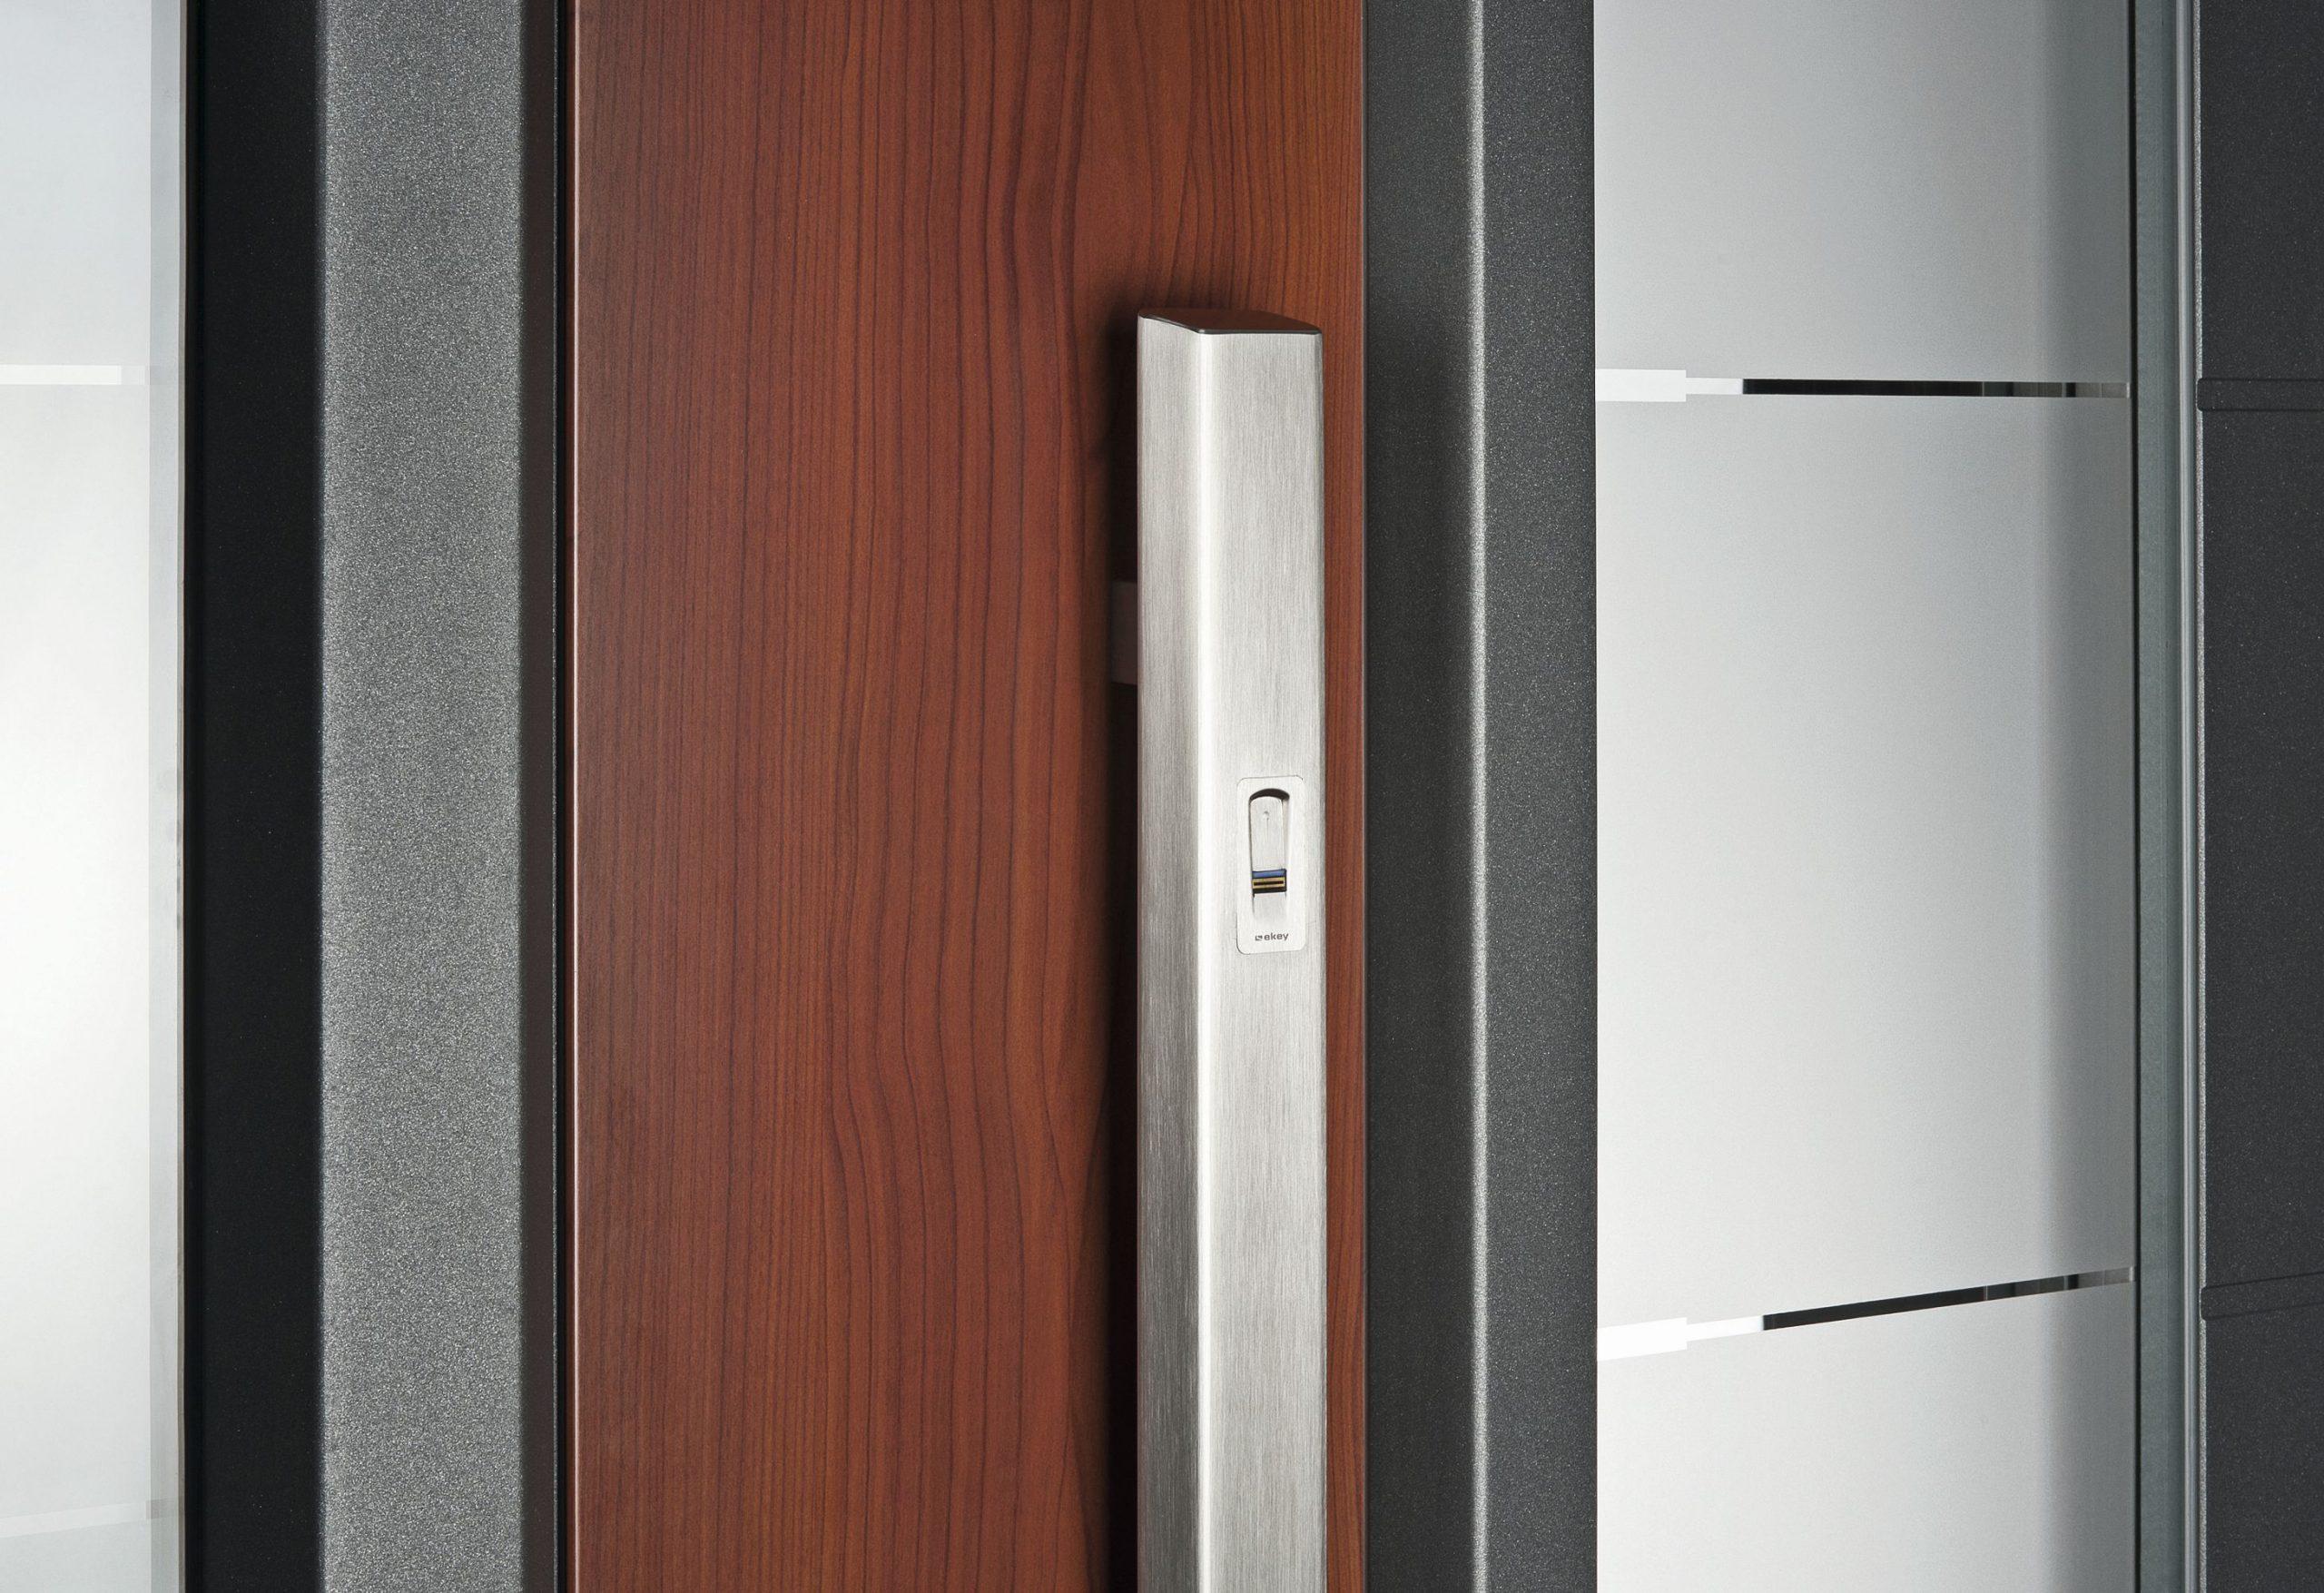 ac-kern-pirnar-türen-fenster-0024-scaled Innovationen